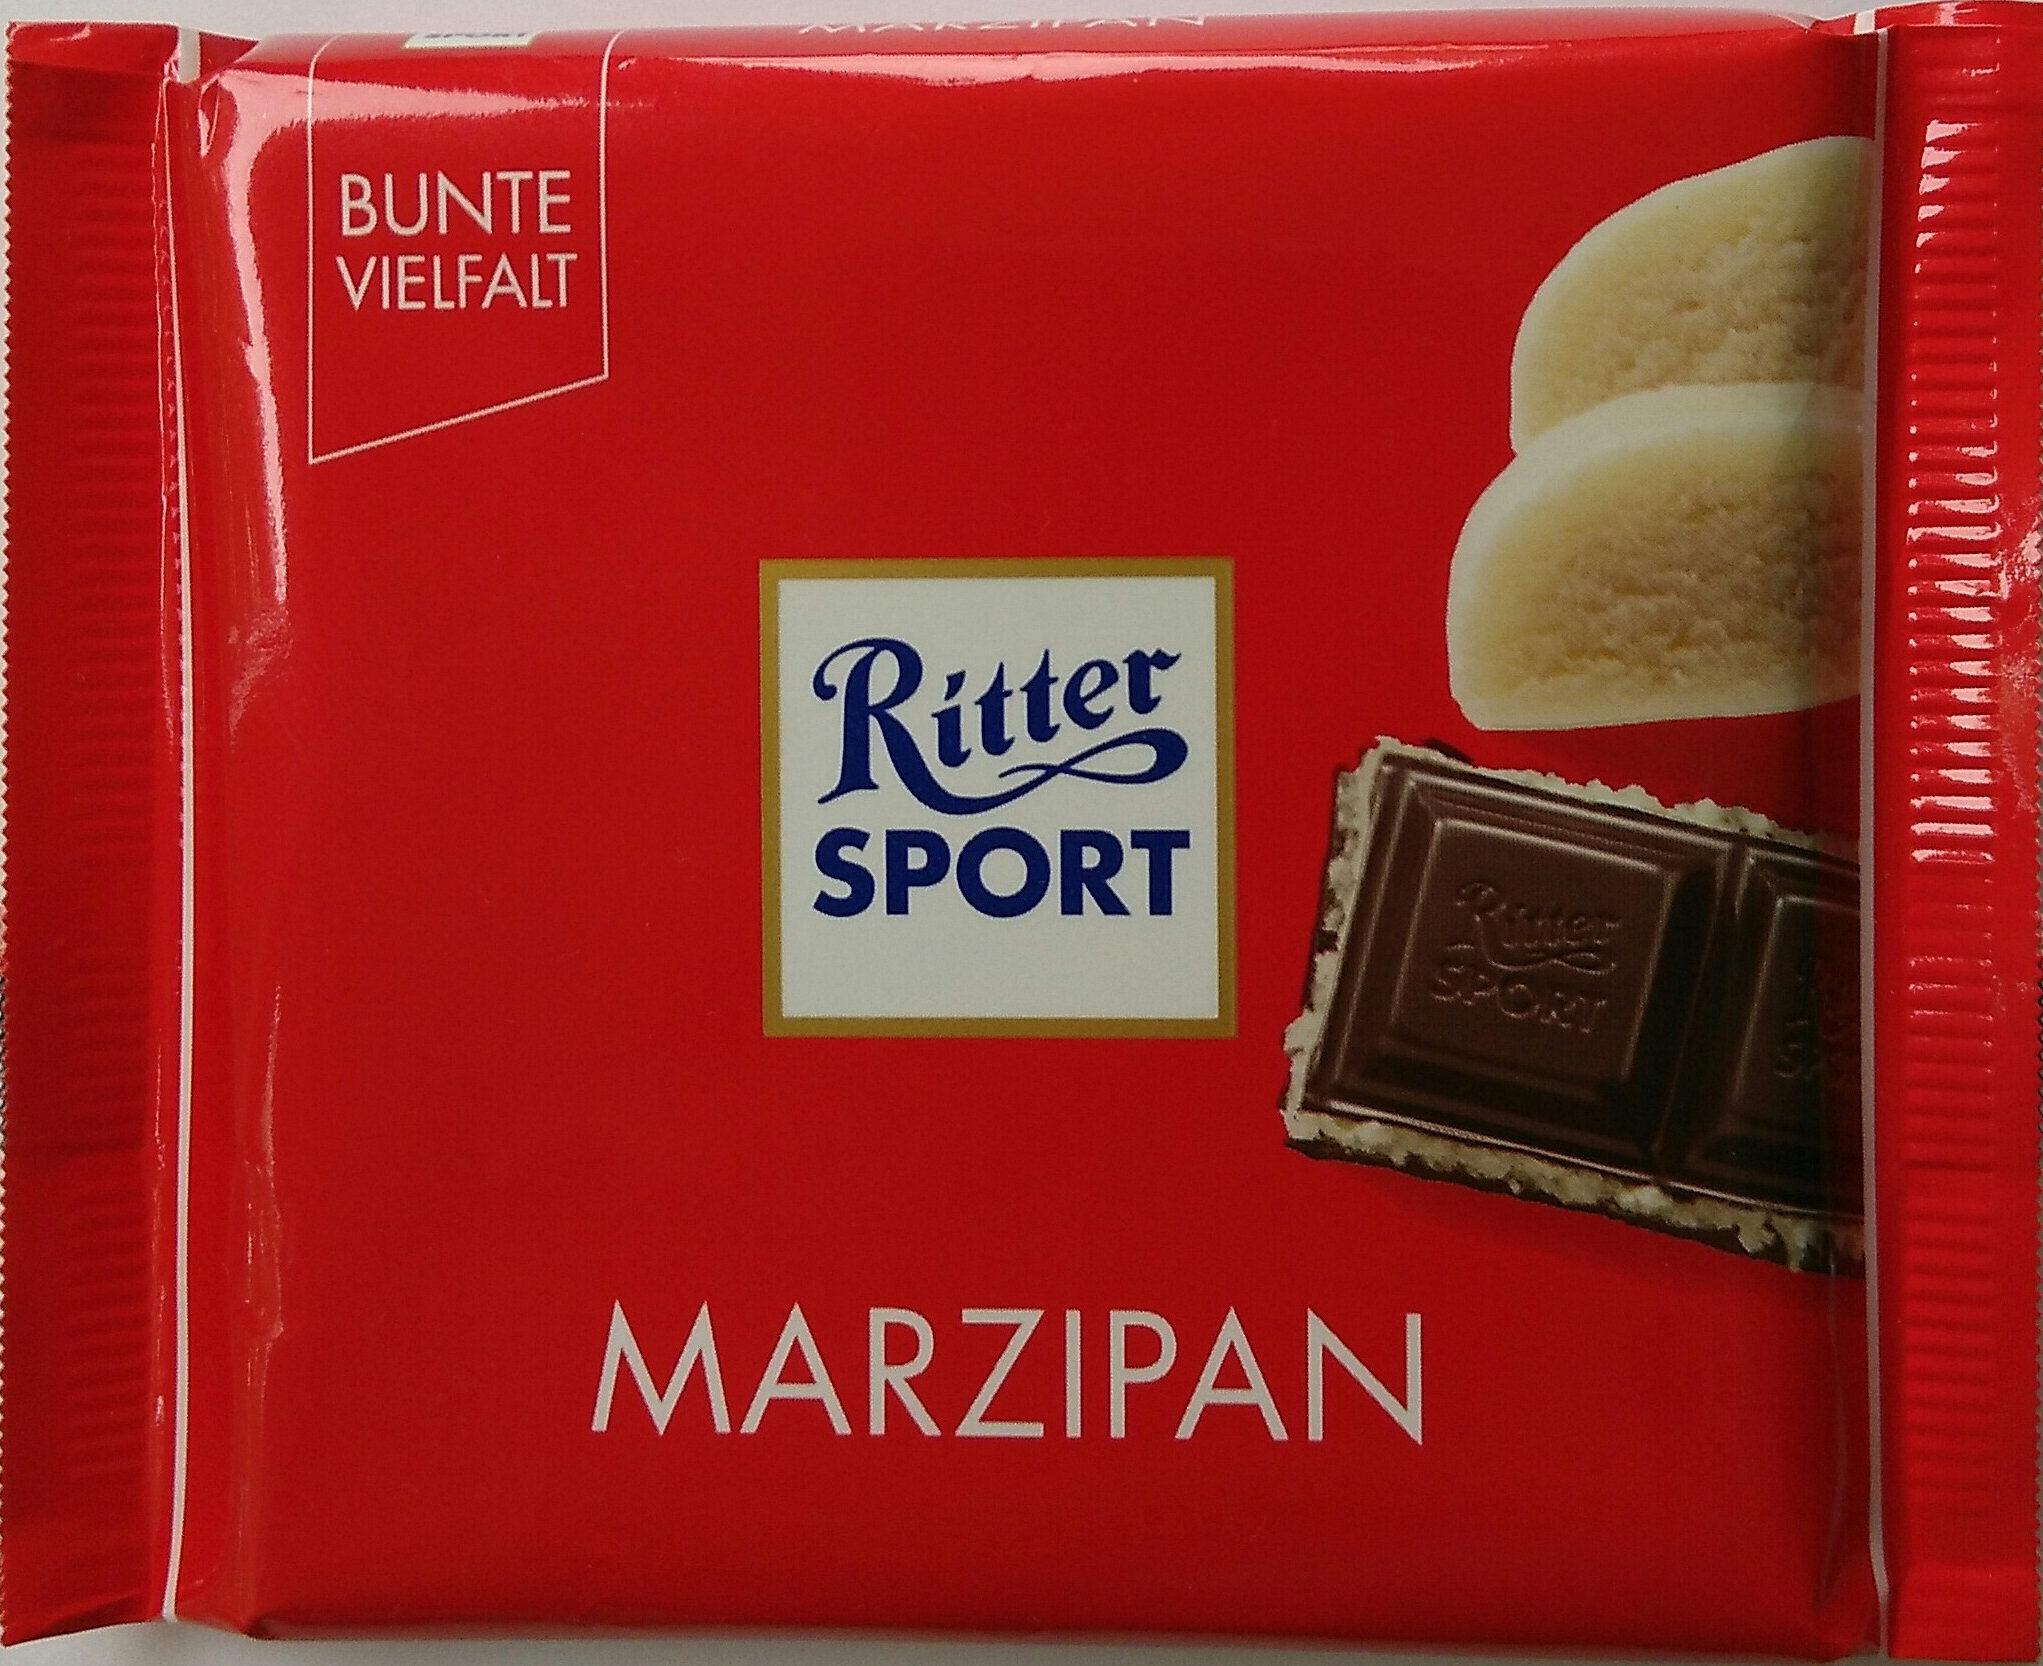 Marzipan - Product